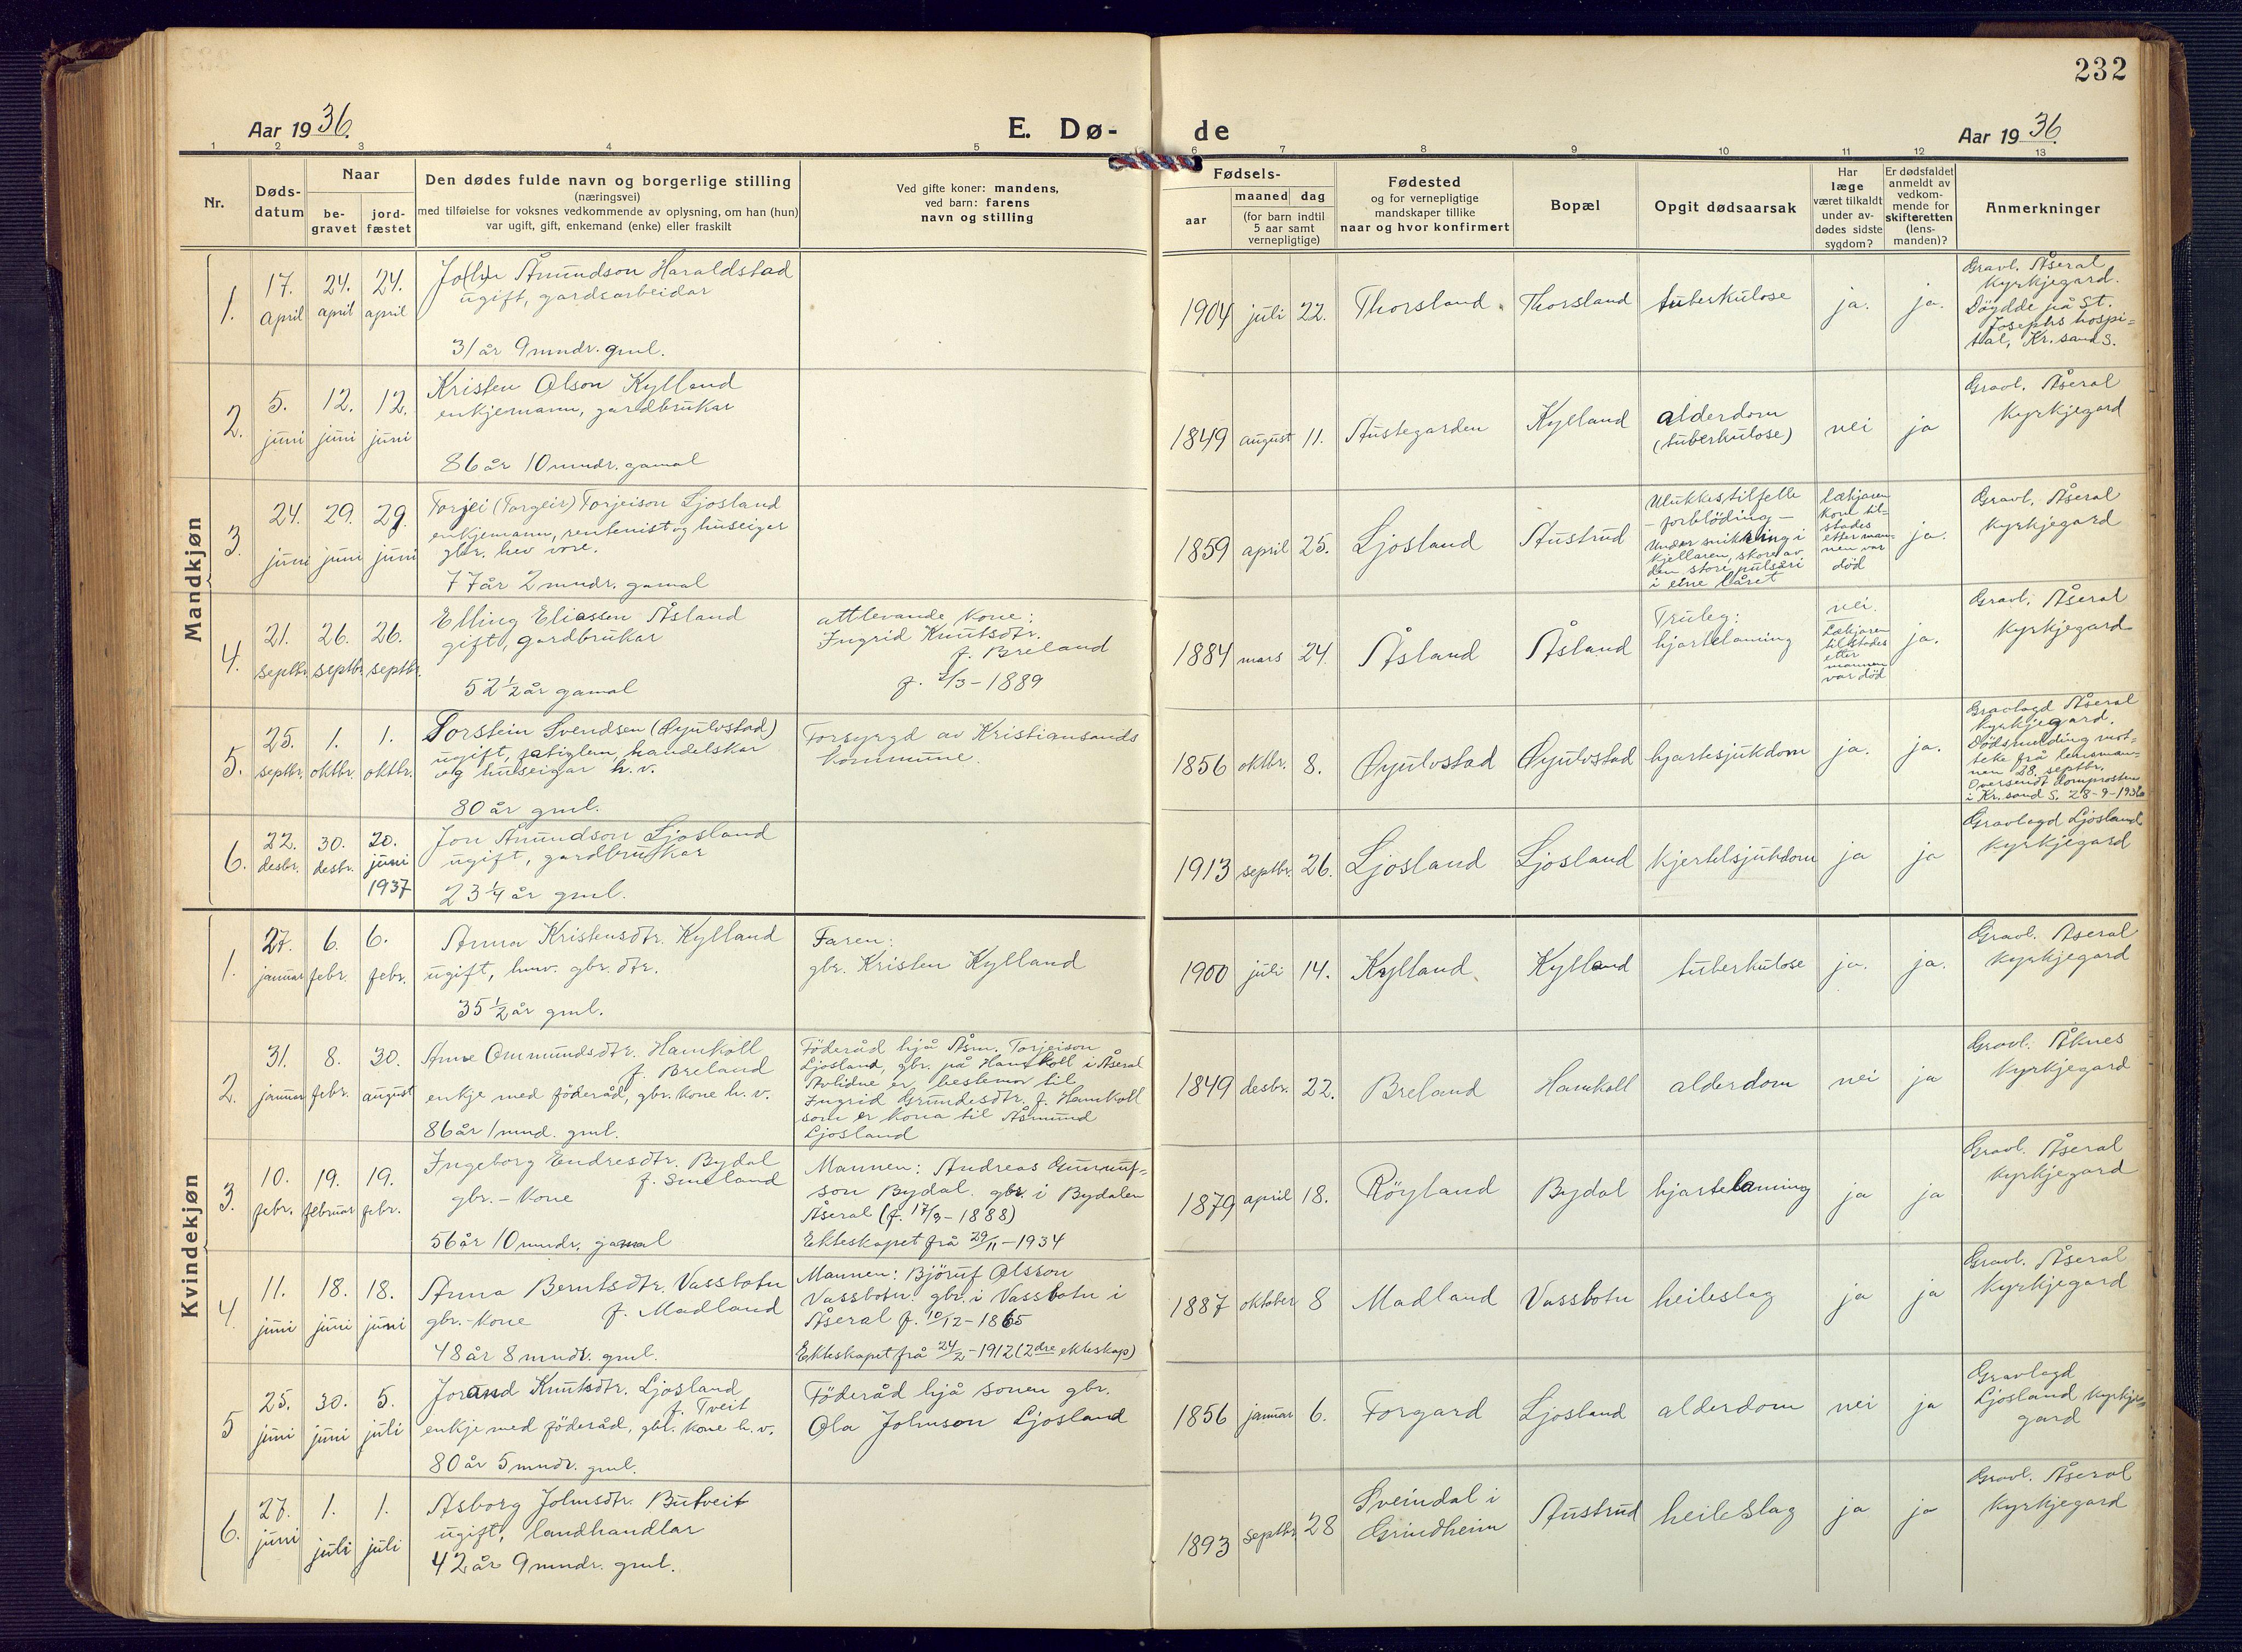 SAK, Åseral sokneprestkontor, F/Fb/L0004: Klokkerbok nr. B 4, 1920-1946, s. 232